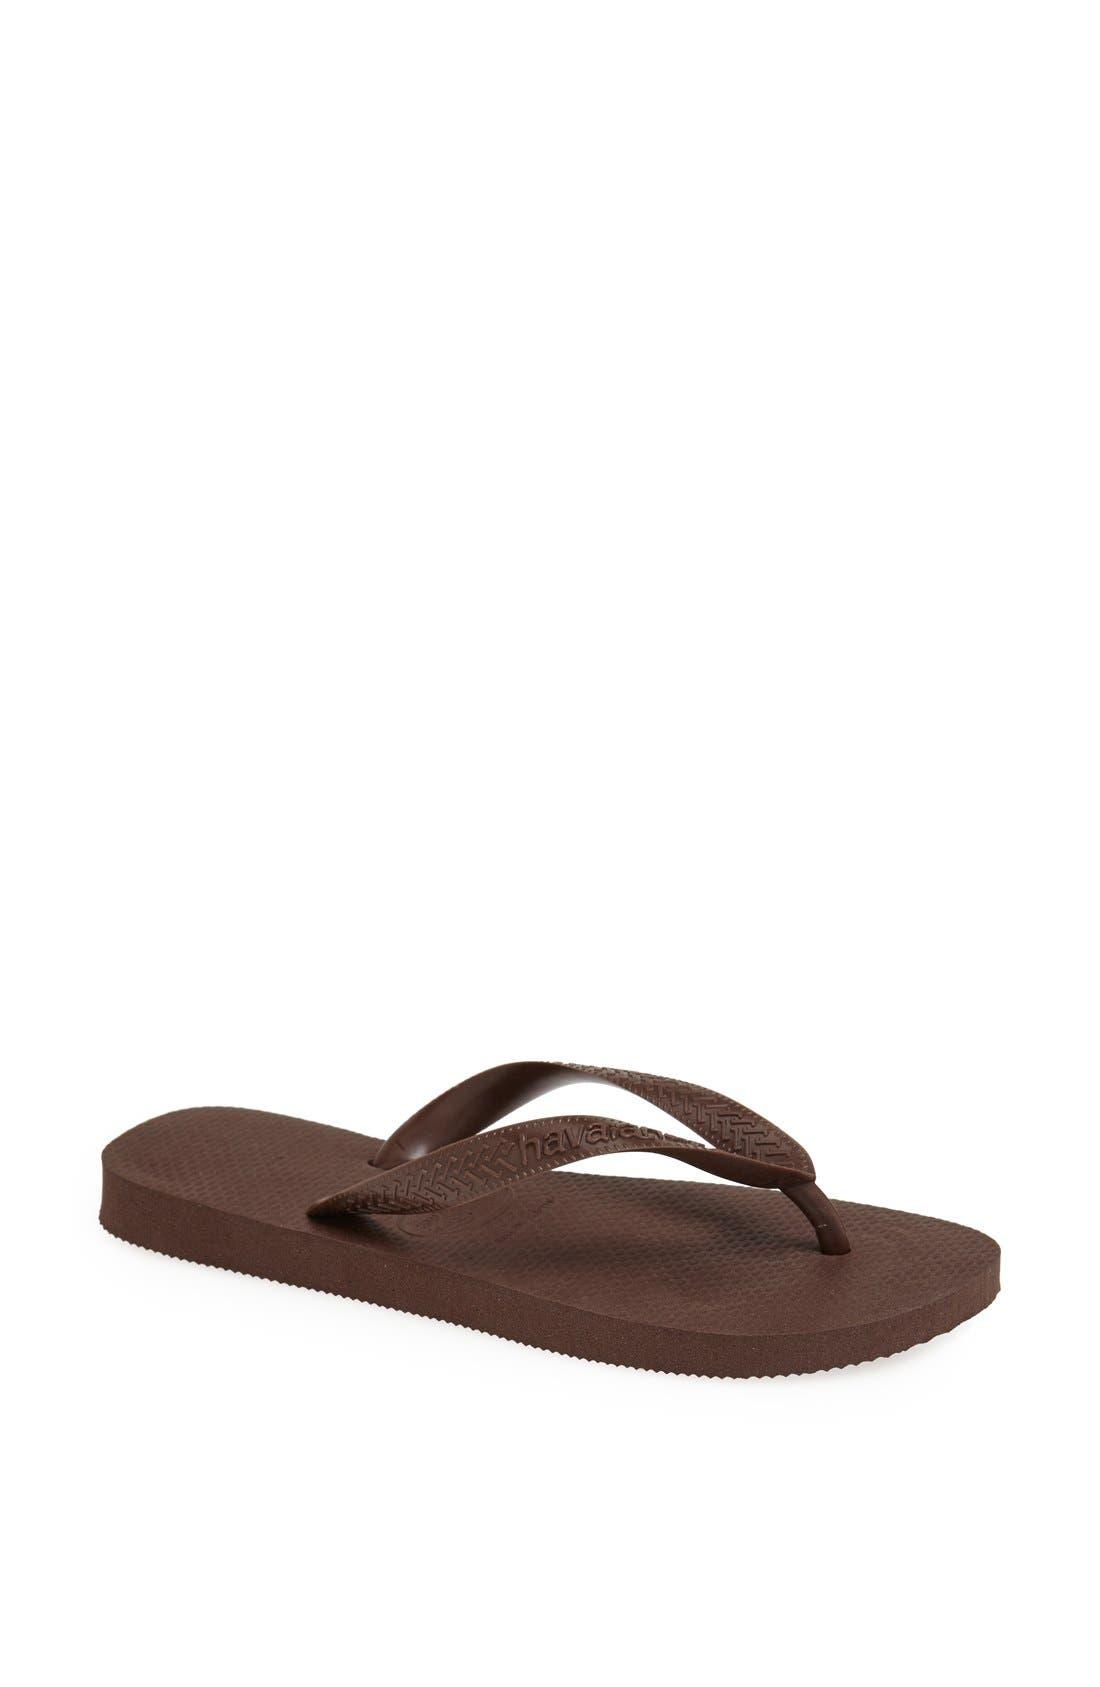 Alternate Image 1 Selected - Havaianas 'Top' Sandal (Women)